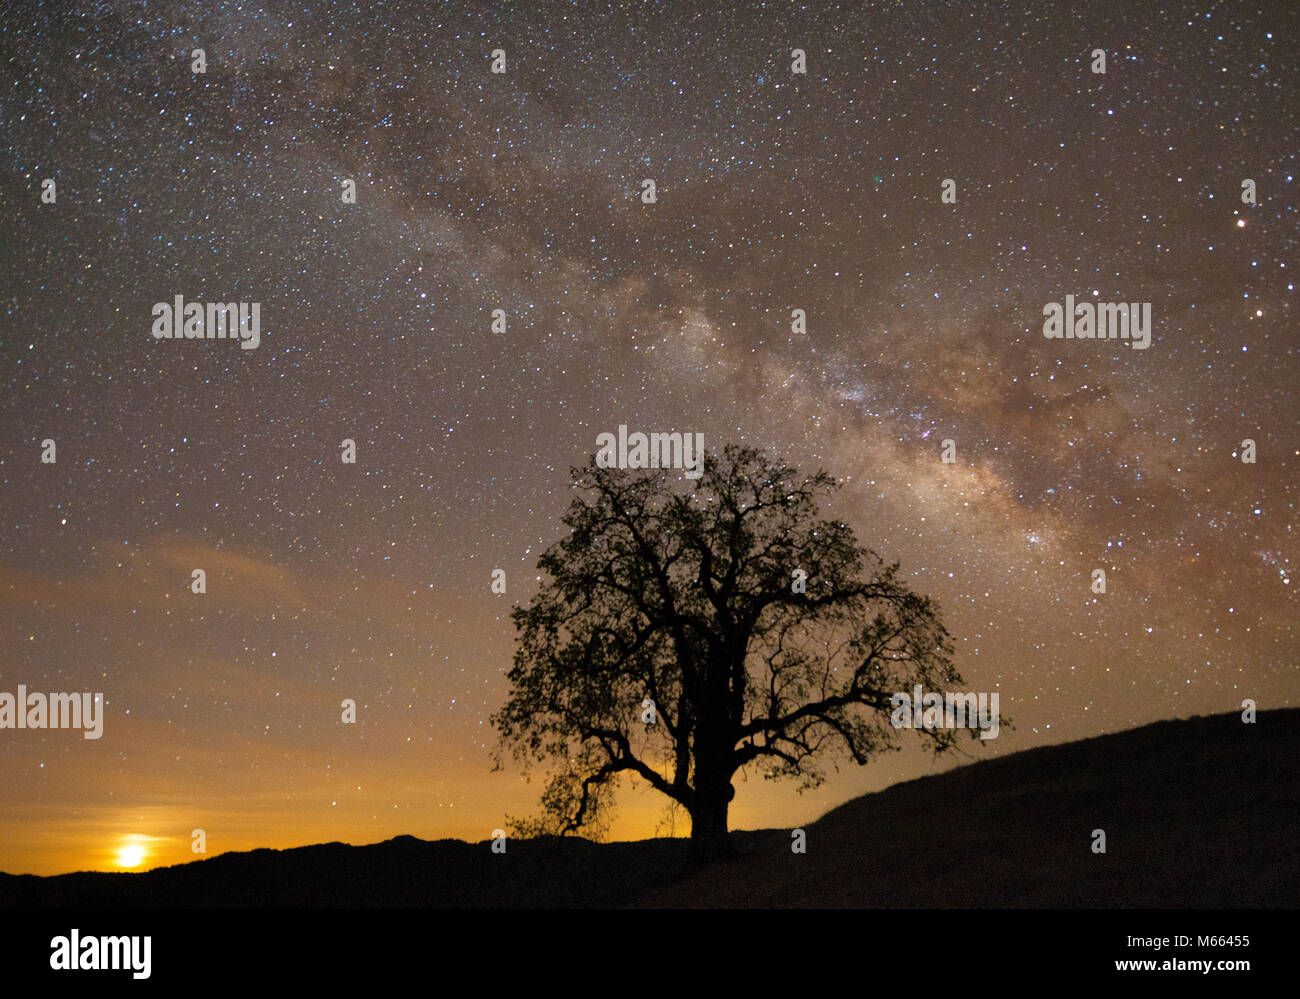 Milchstraße, Mondaufgang, Coast Live Oak, Quercus agrifolia, Los Padres National Forest, Monterey County, Kalifornien Stockbild